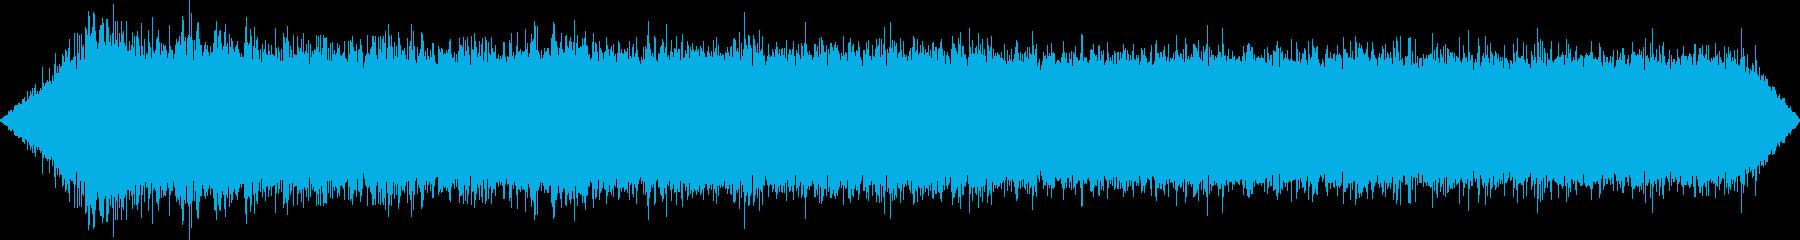 ASMR 夏の森の川に落ちる滝の音とセミの再生済みの波形